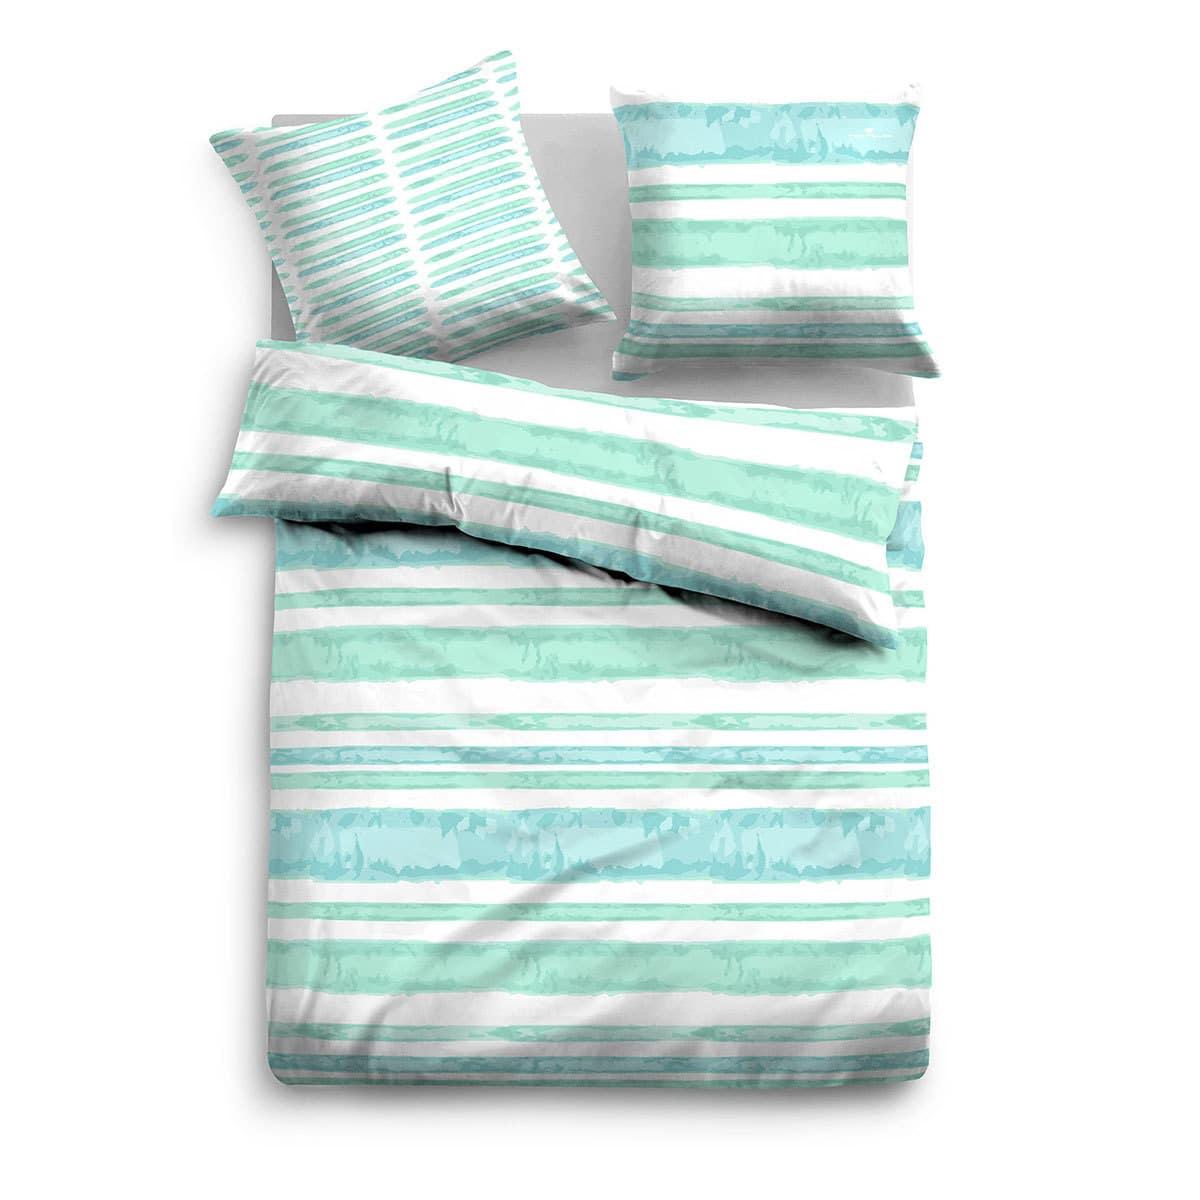 tom tailor bettw sche 49844 842 mint g nstig online kaufen bei bettwaren shop. Black Bedroom Furniture Sets. Home Design Ideas